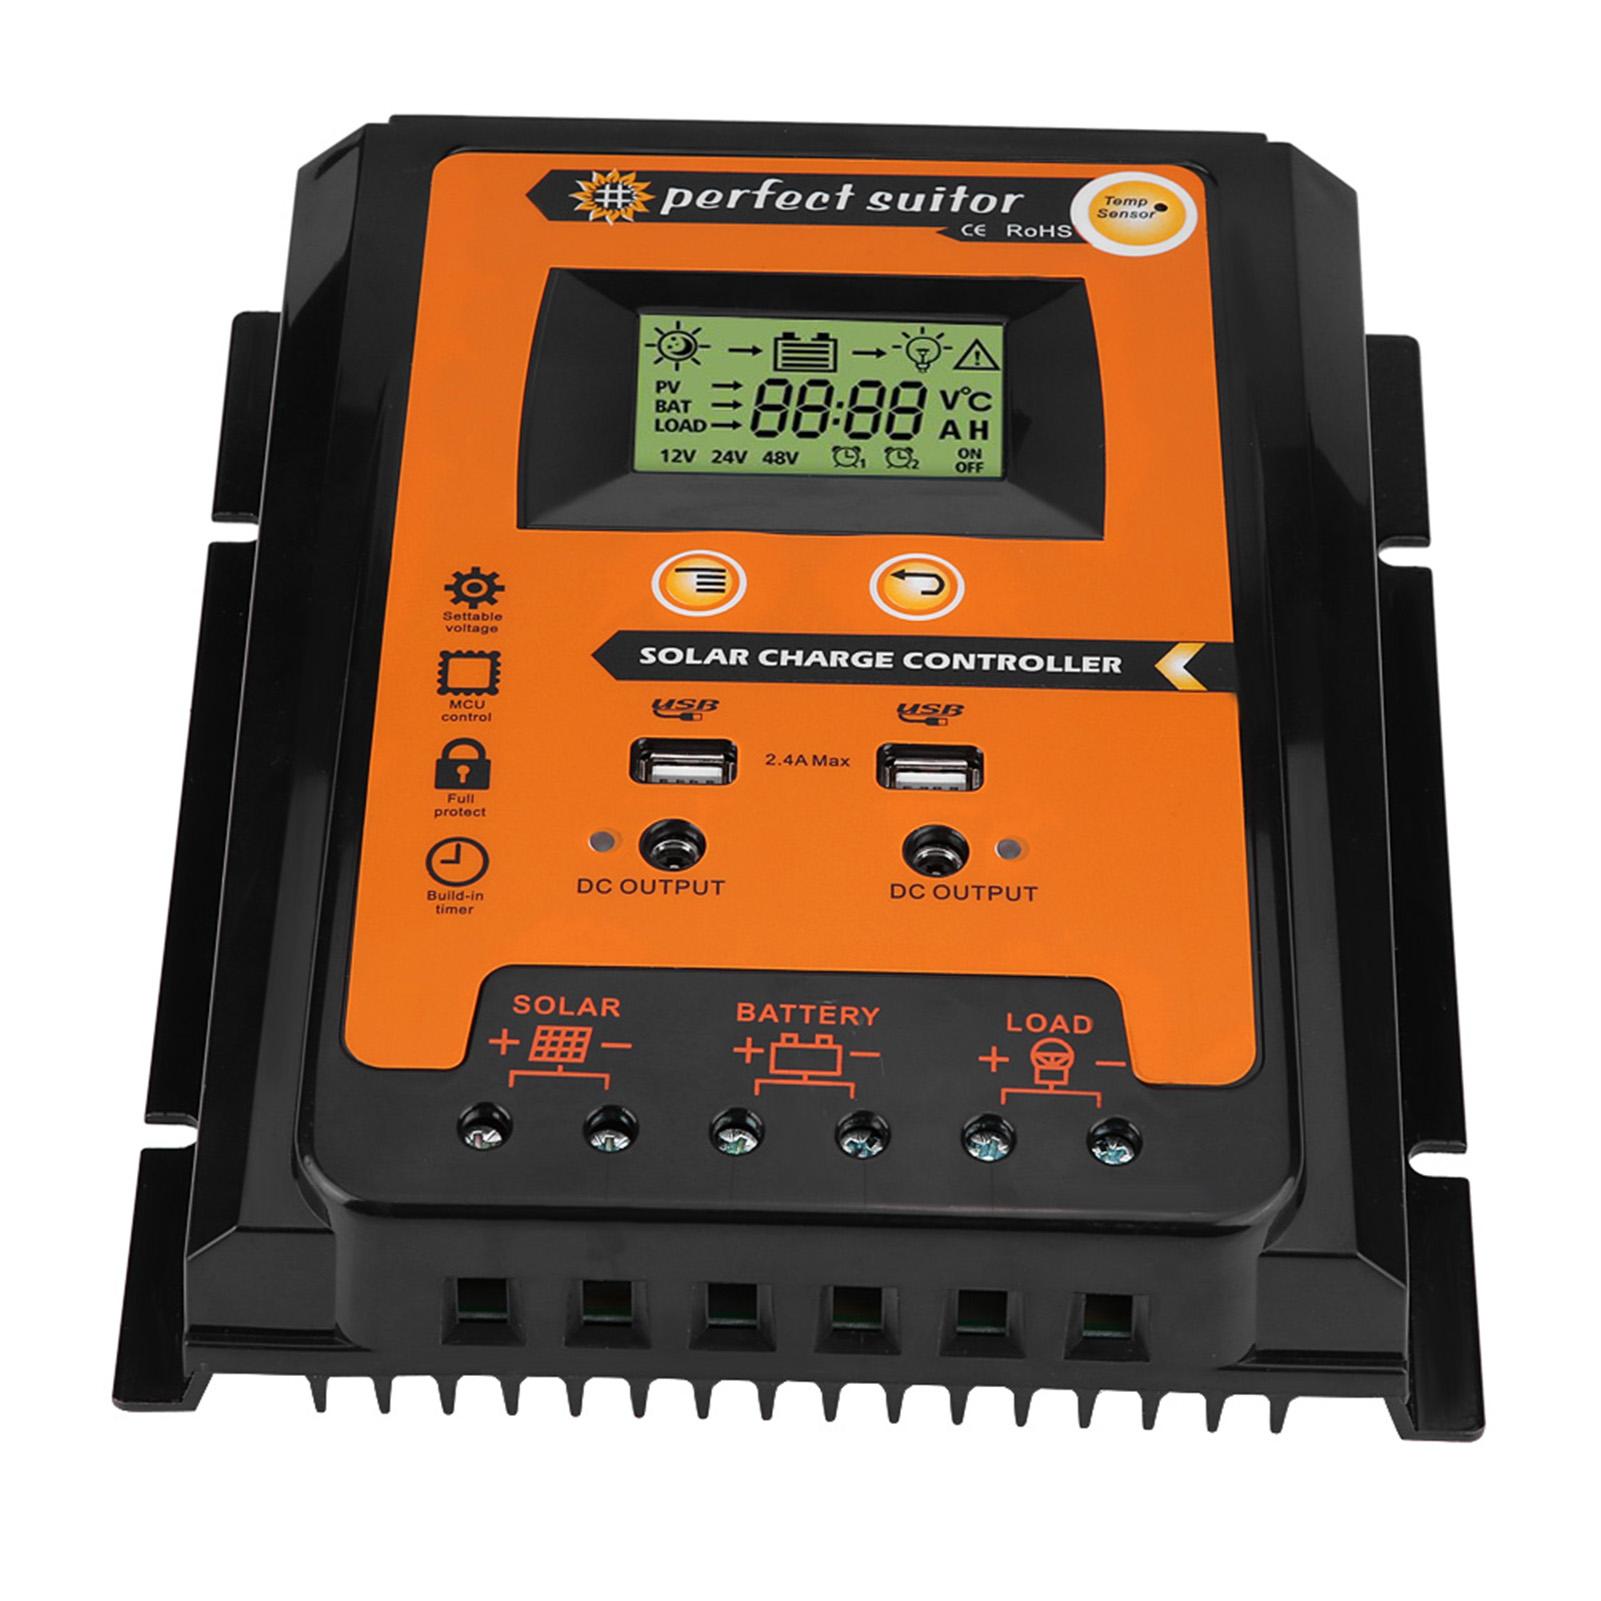 12V-24V-70A-MPPT-Regolatore-Di-Carica-Solare-LCD-Dual-USB-Batteria-Controller miniatura 16